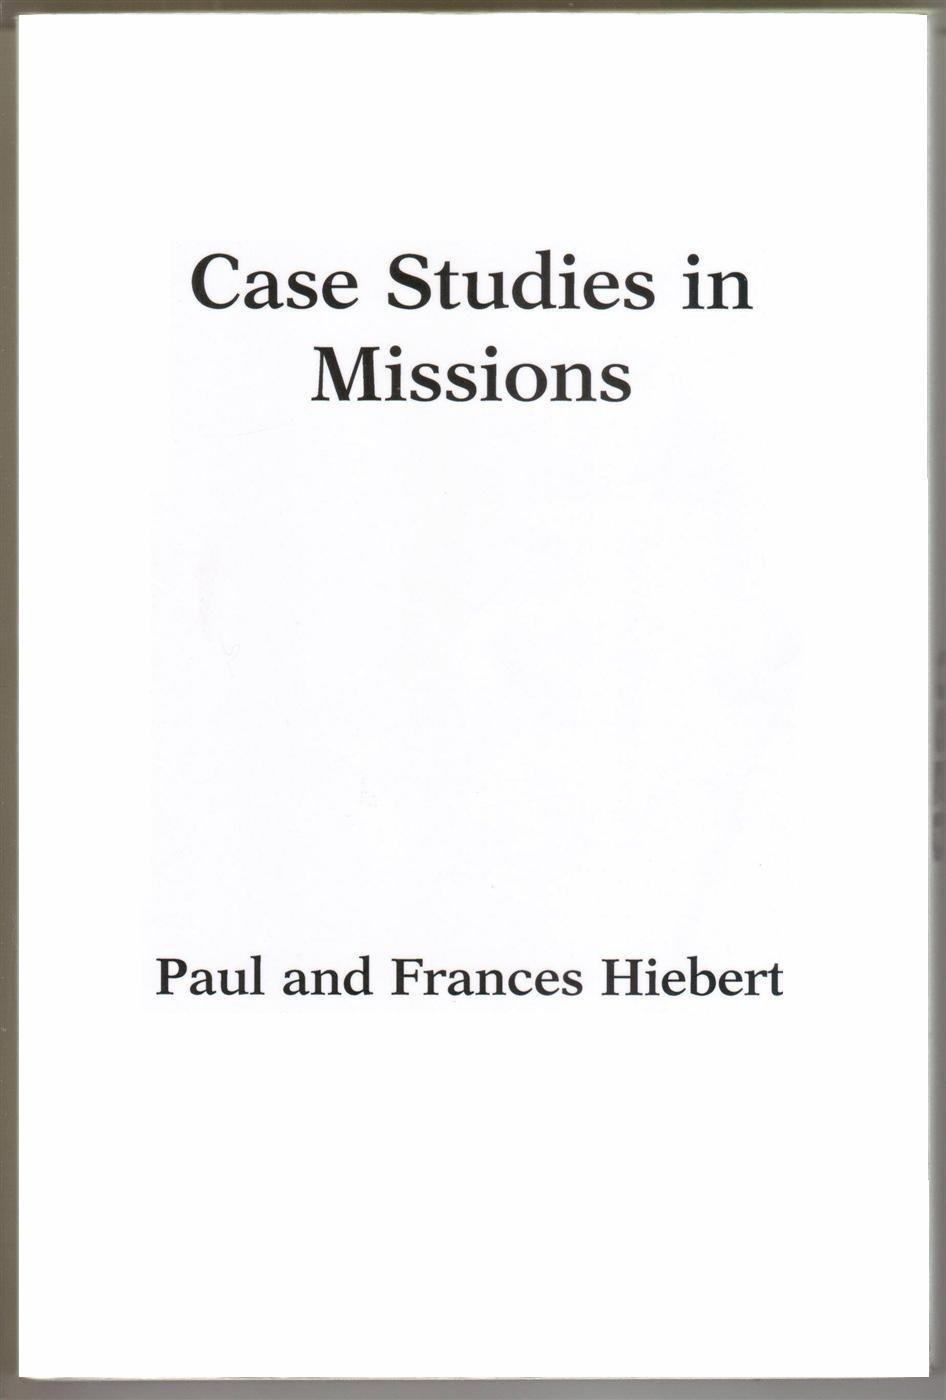 Case Studies in Missions